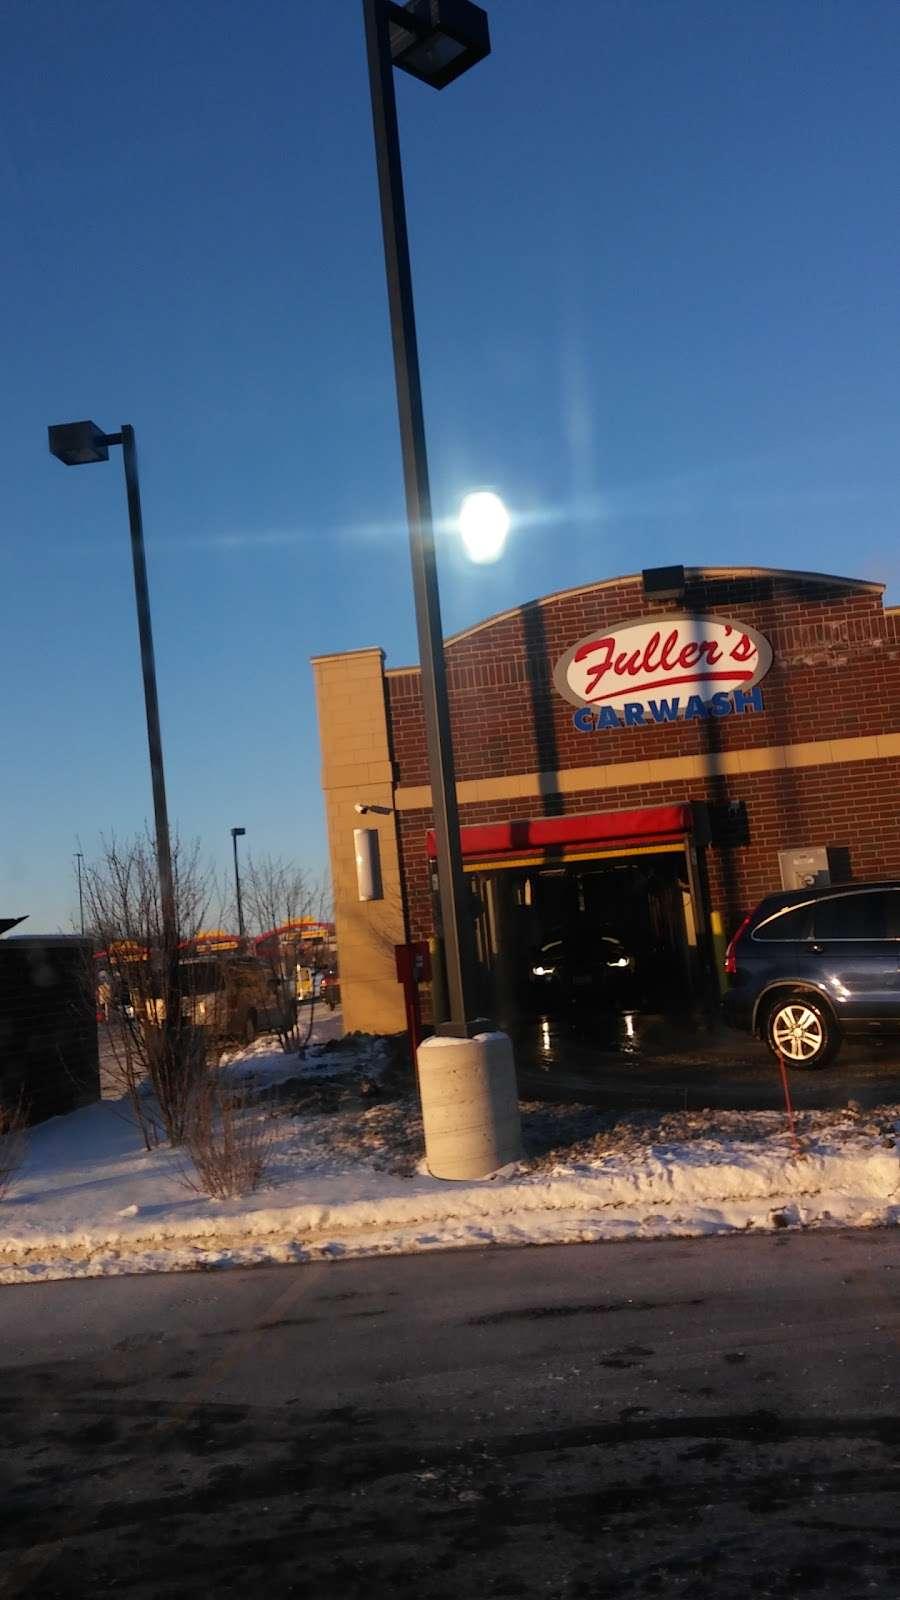 Fullers Car Wash - car wash  | Photo 8 of 10 | Address: 1180 S Randall Rd, Elgin, IL 60124, USA | Phone: (708) 300-6968